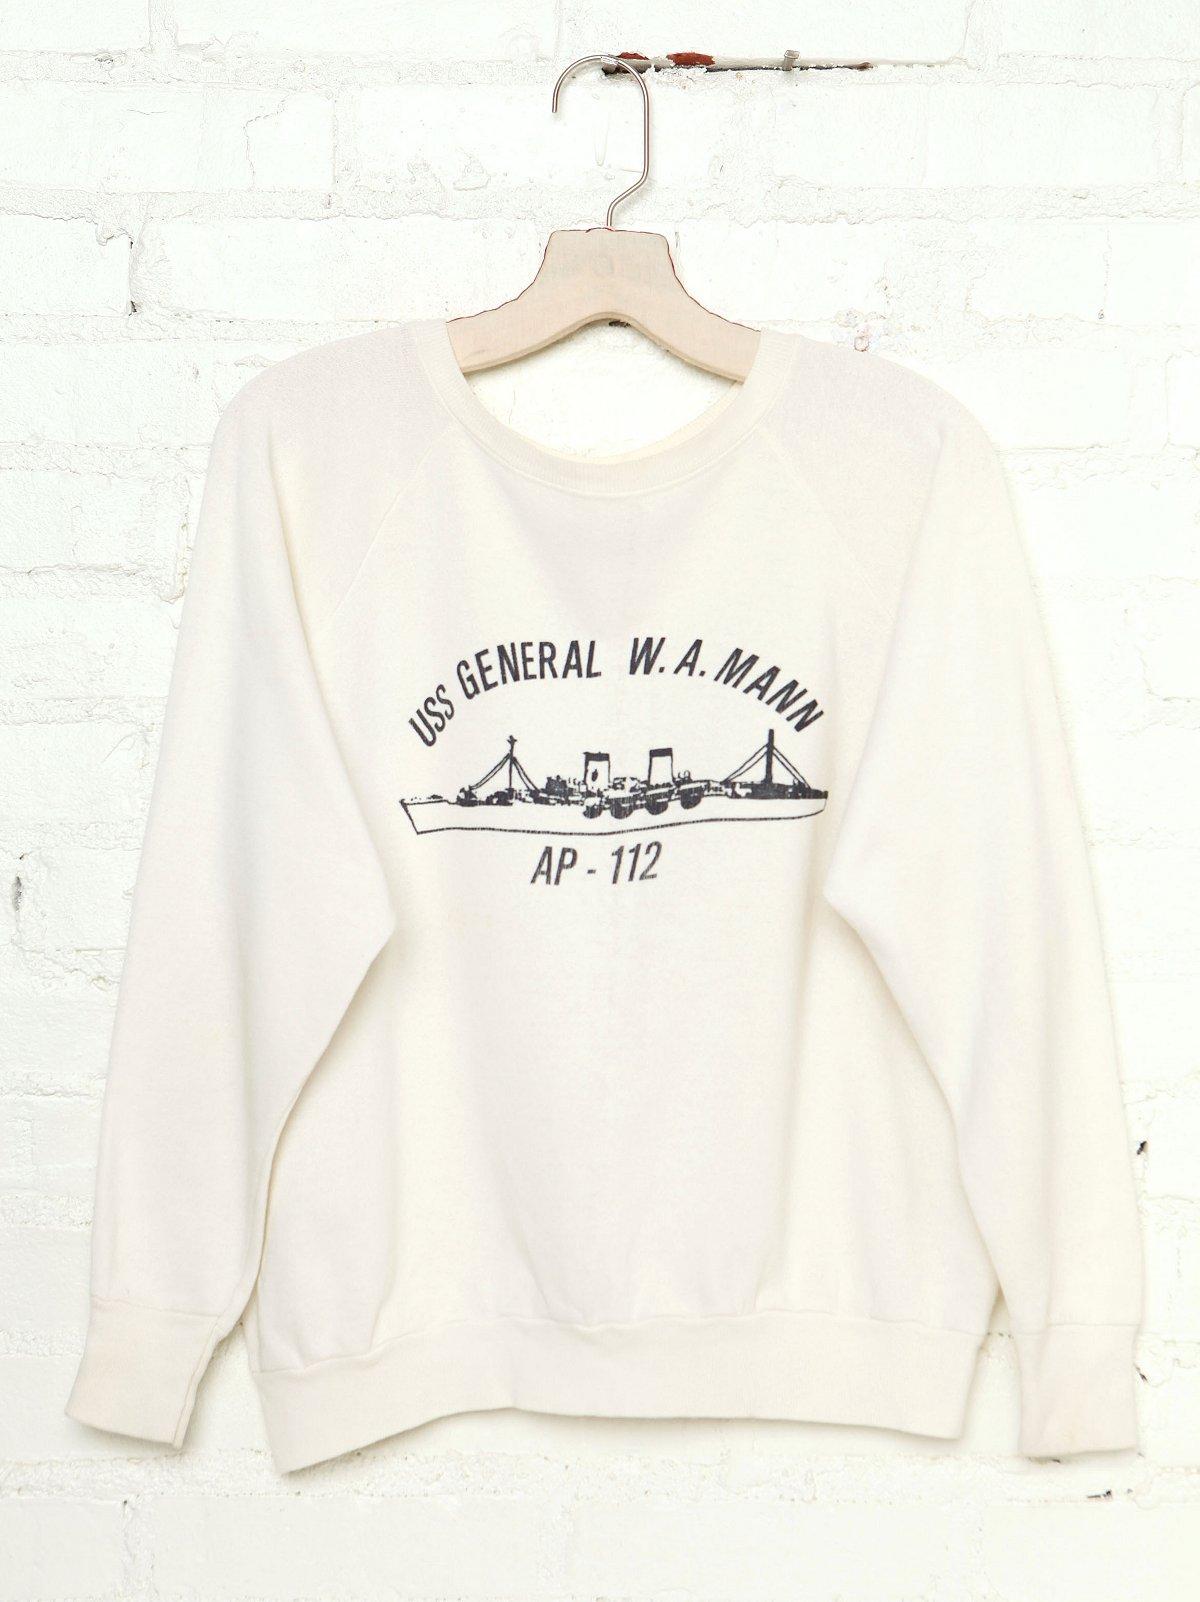 Vintage USS General W.A. Mann Sweatshirt